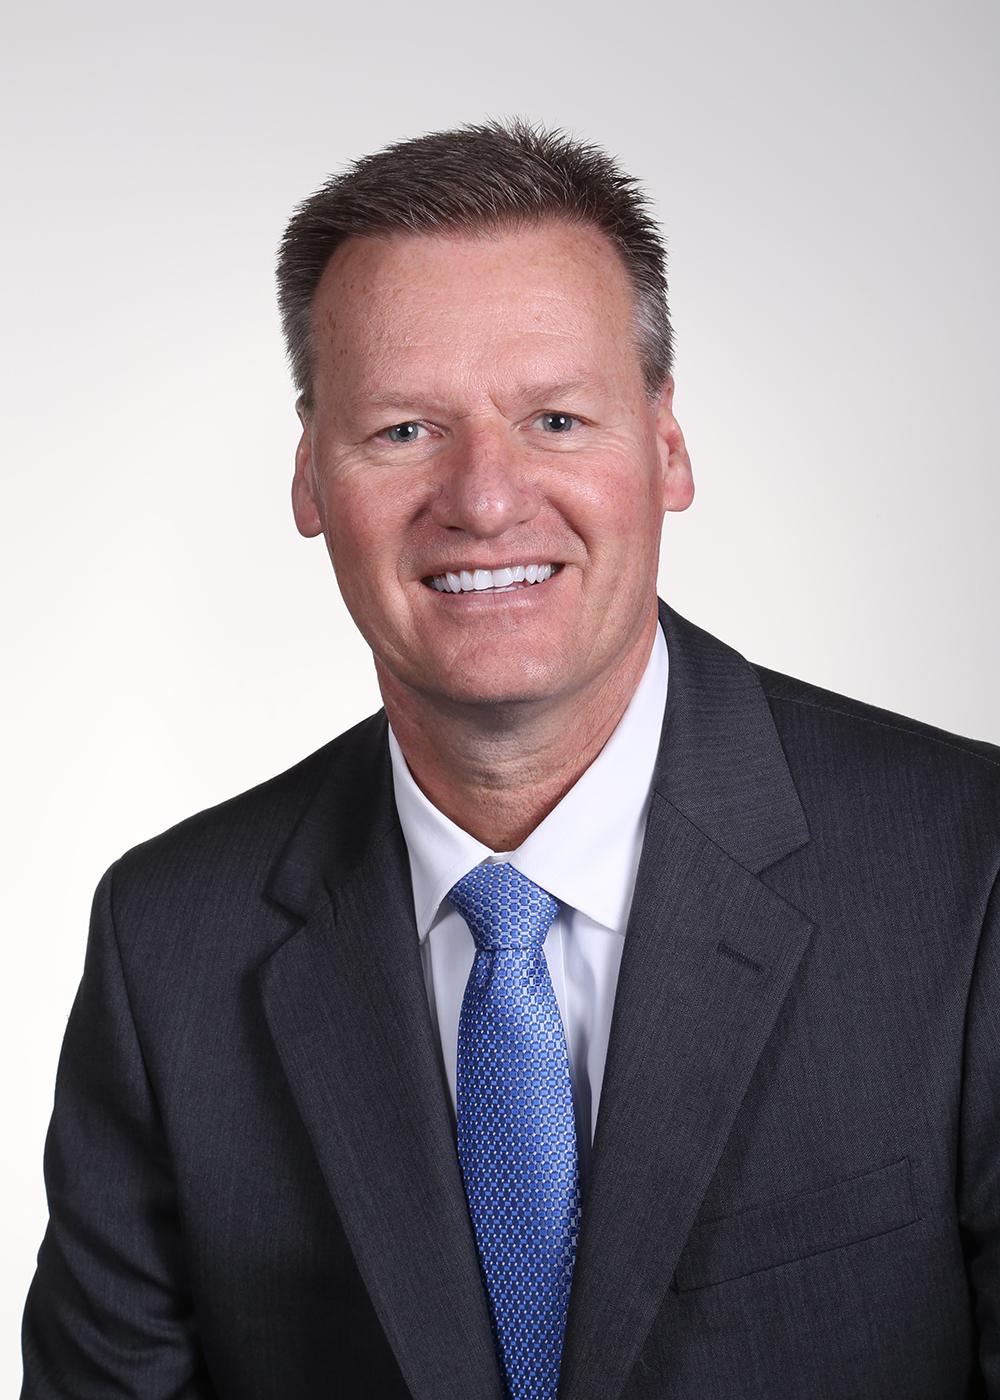 Bryan Albrecht <br> President & CEO <br> Gateway Technical College